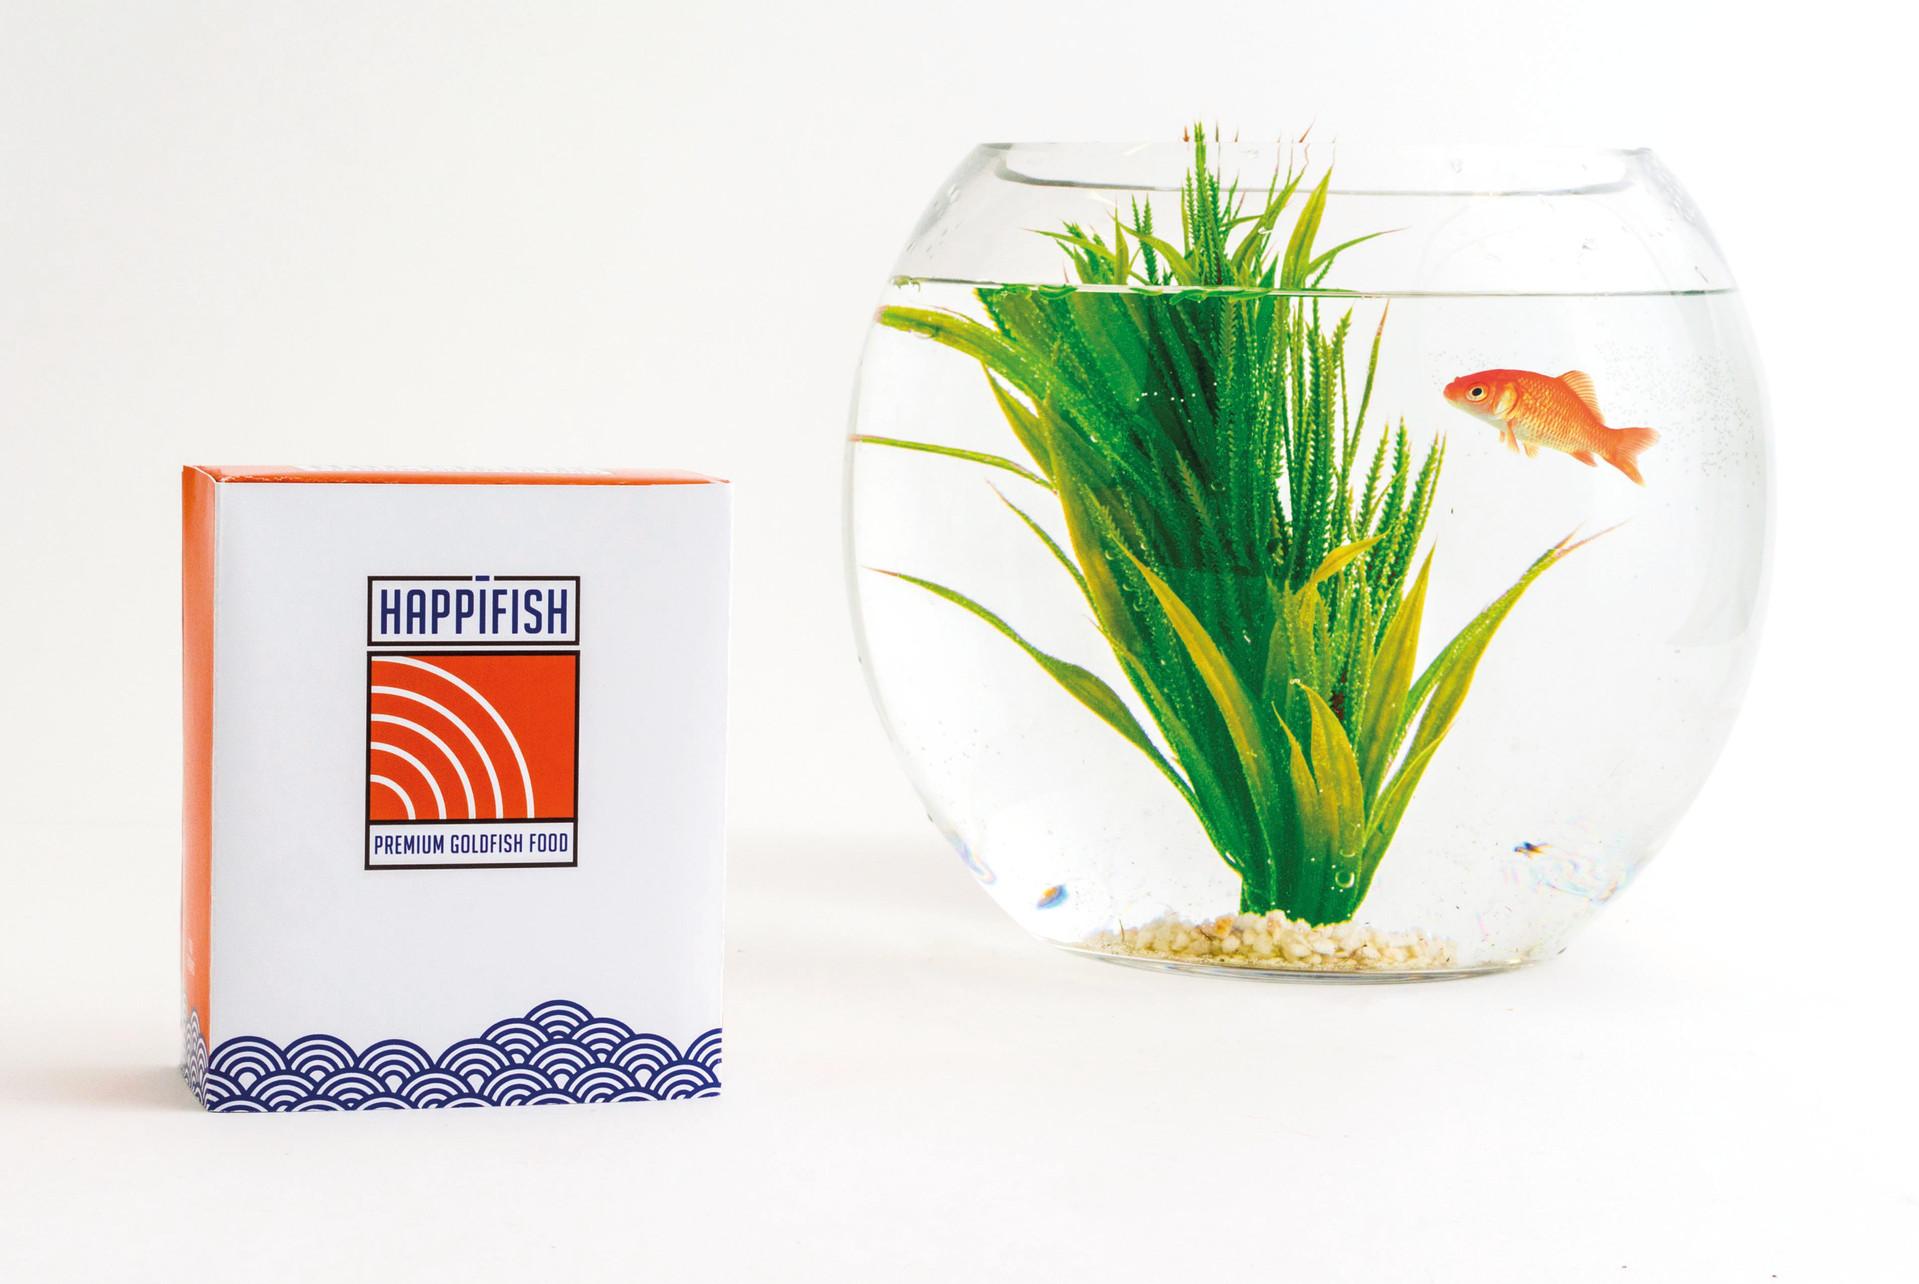 HappiFish Fish Food Packaging